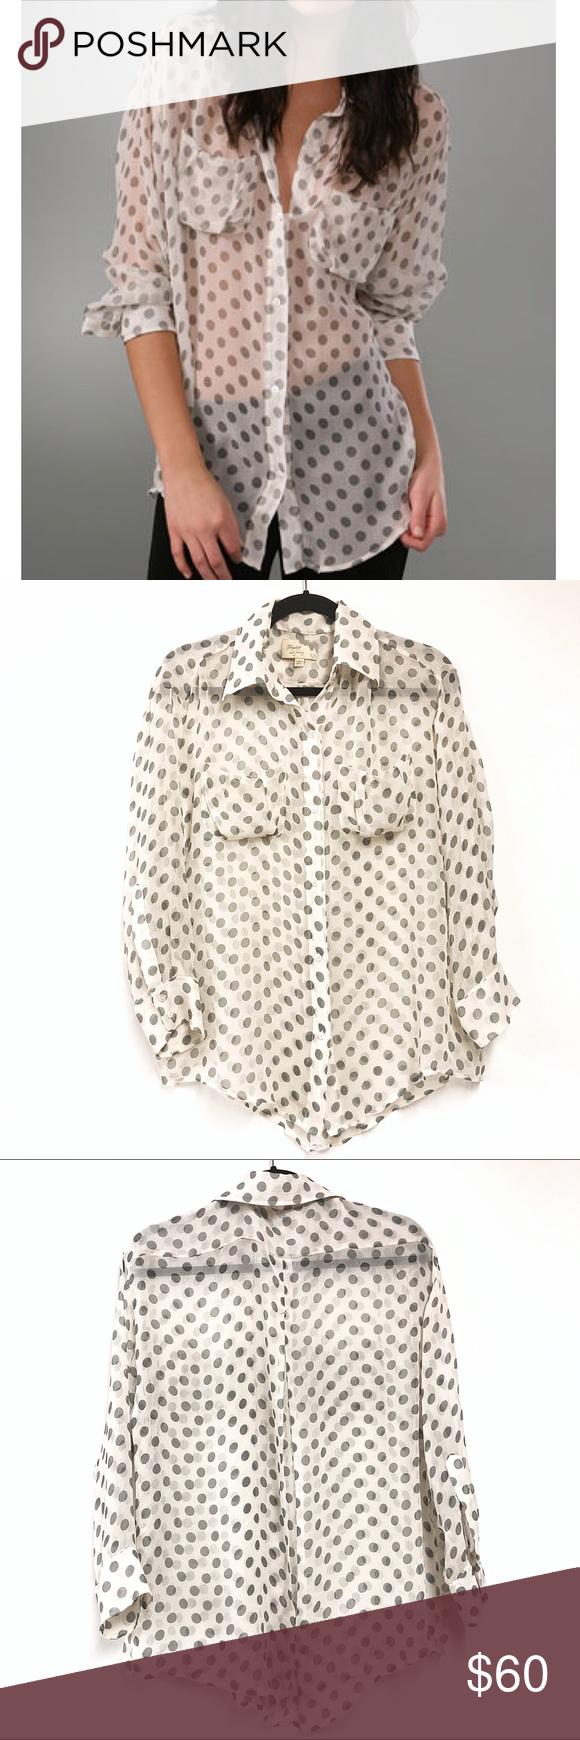 b5884de1b33a3 Elizabeth   James Silk Blouse Elizabeth   James  Artist  polka dot silk-chiffon  blouse. Size XS. Chest pockets. Sheer. Great condition. Retail  245.